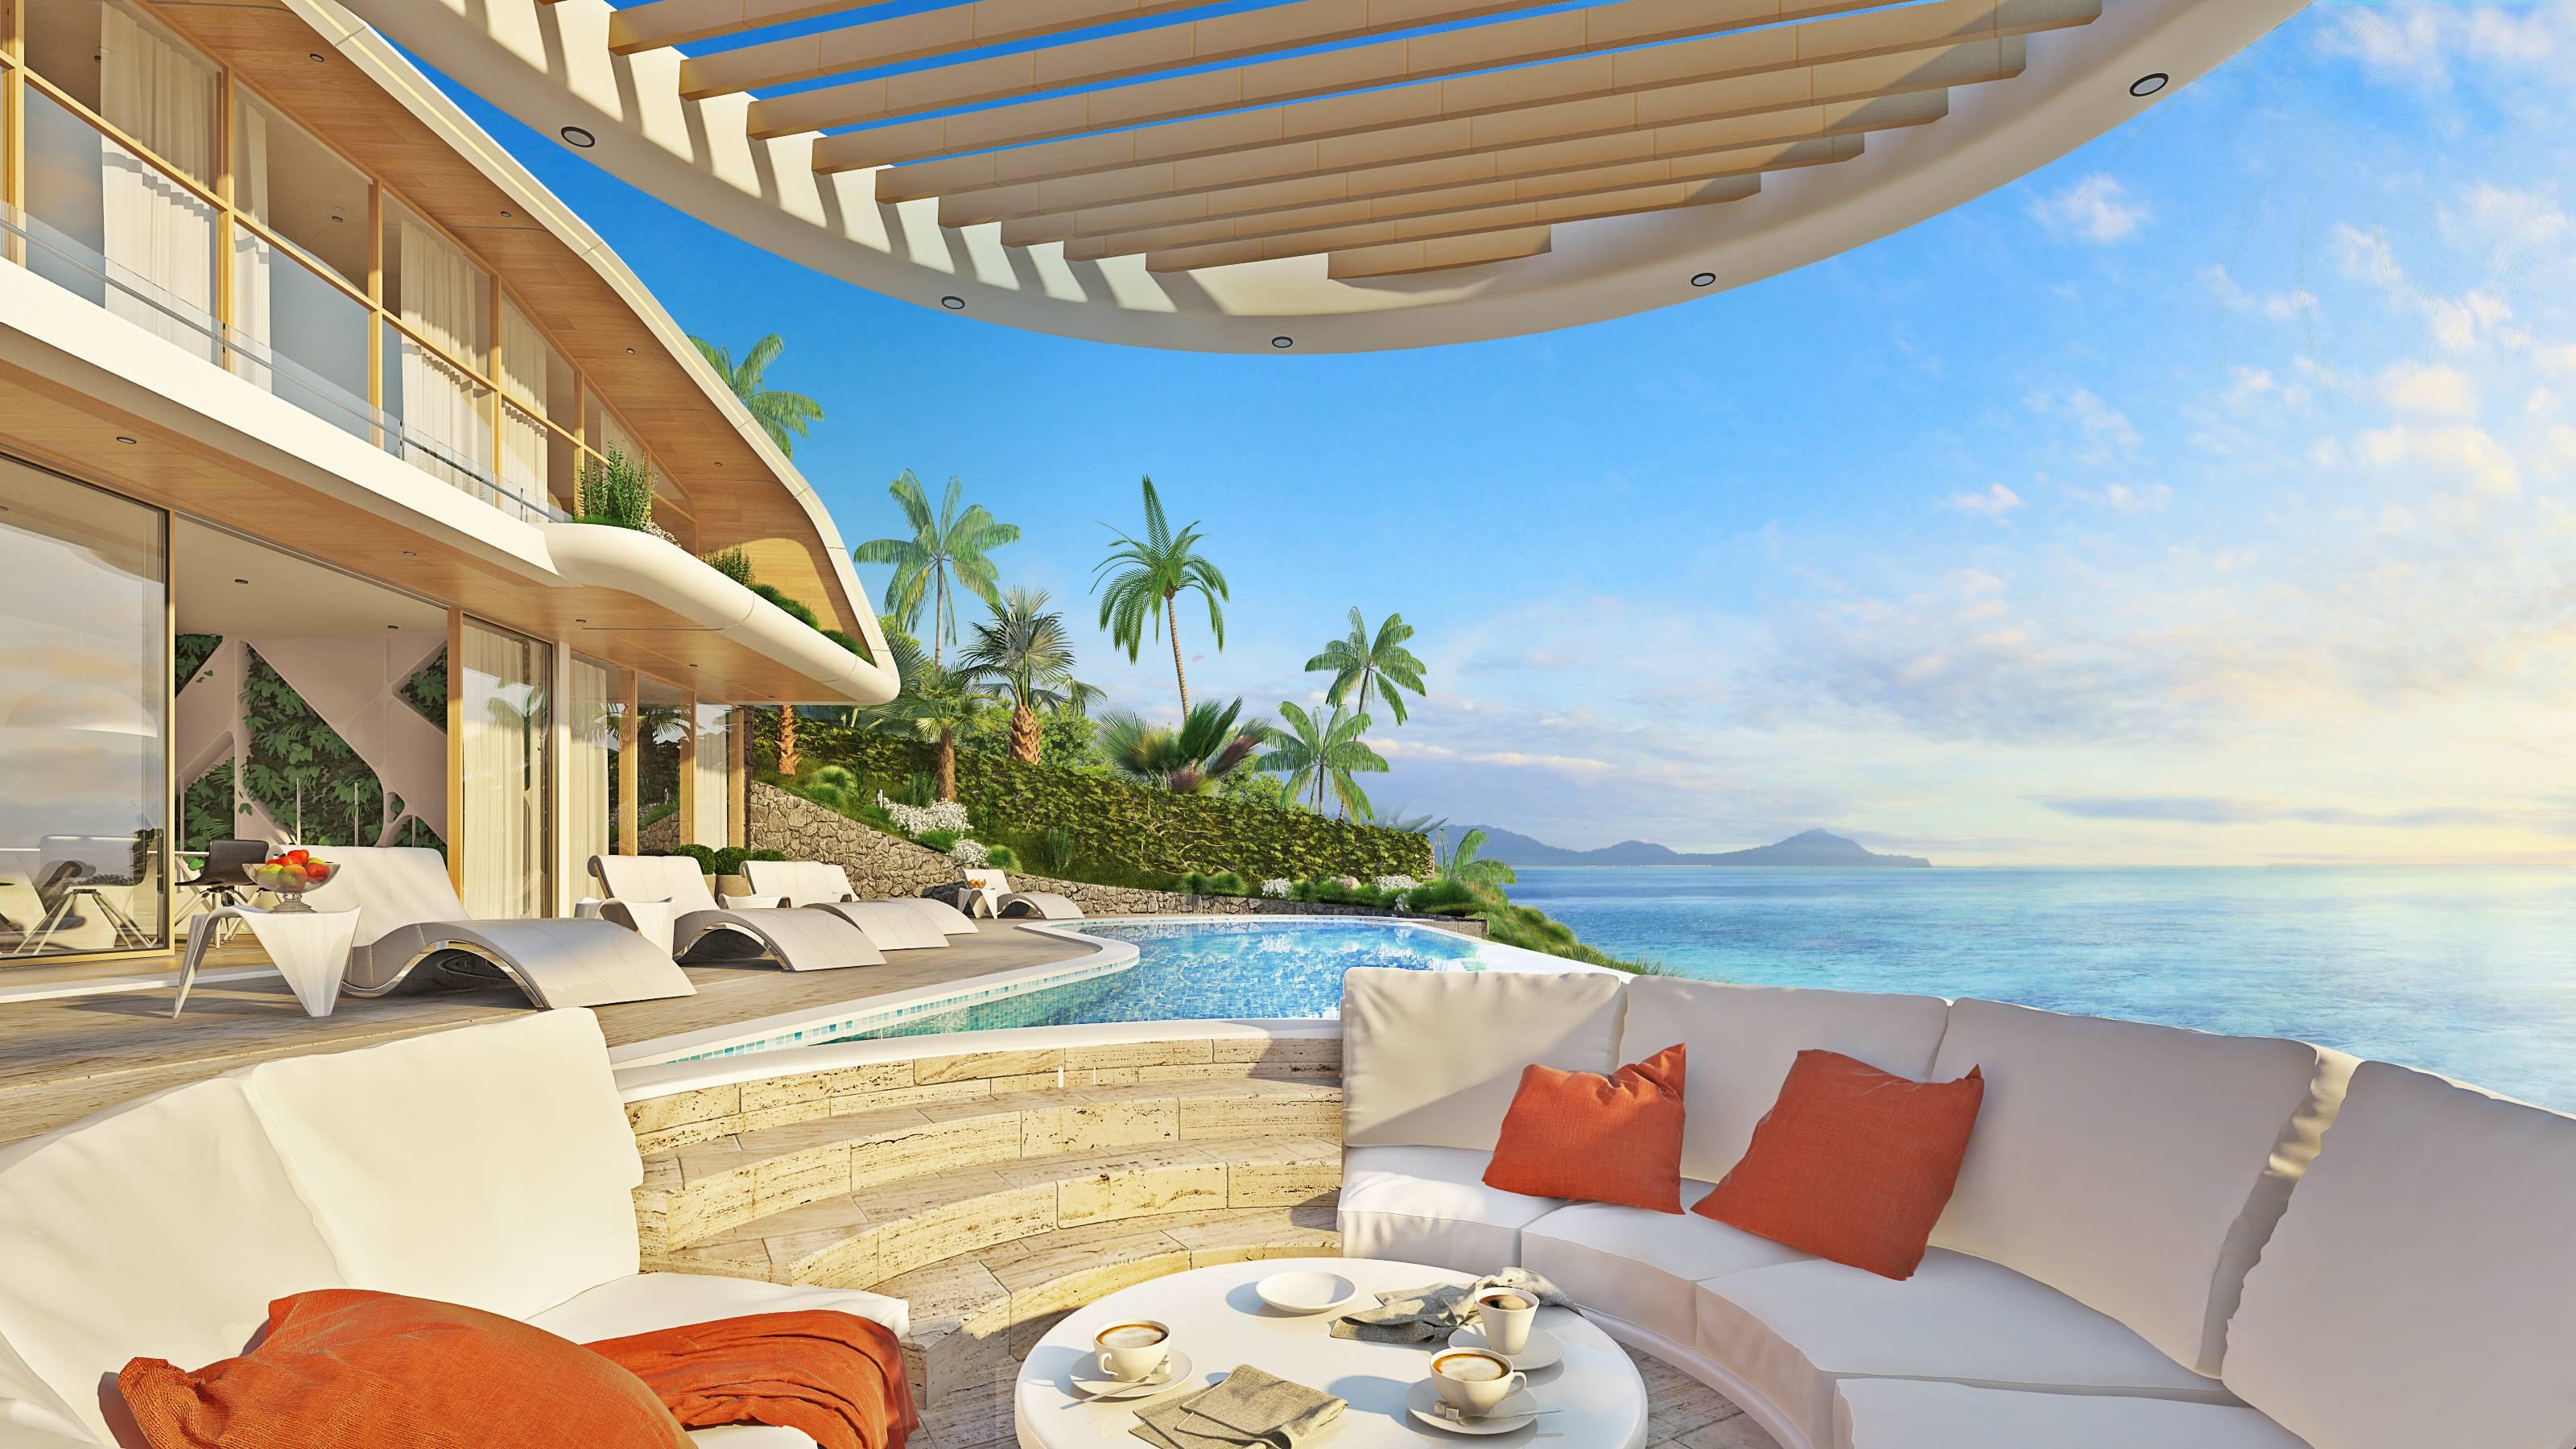 Sea view deck for luxury Villa D2